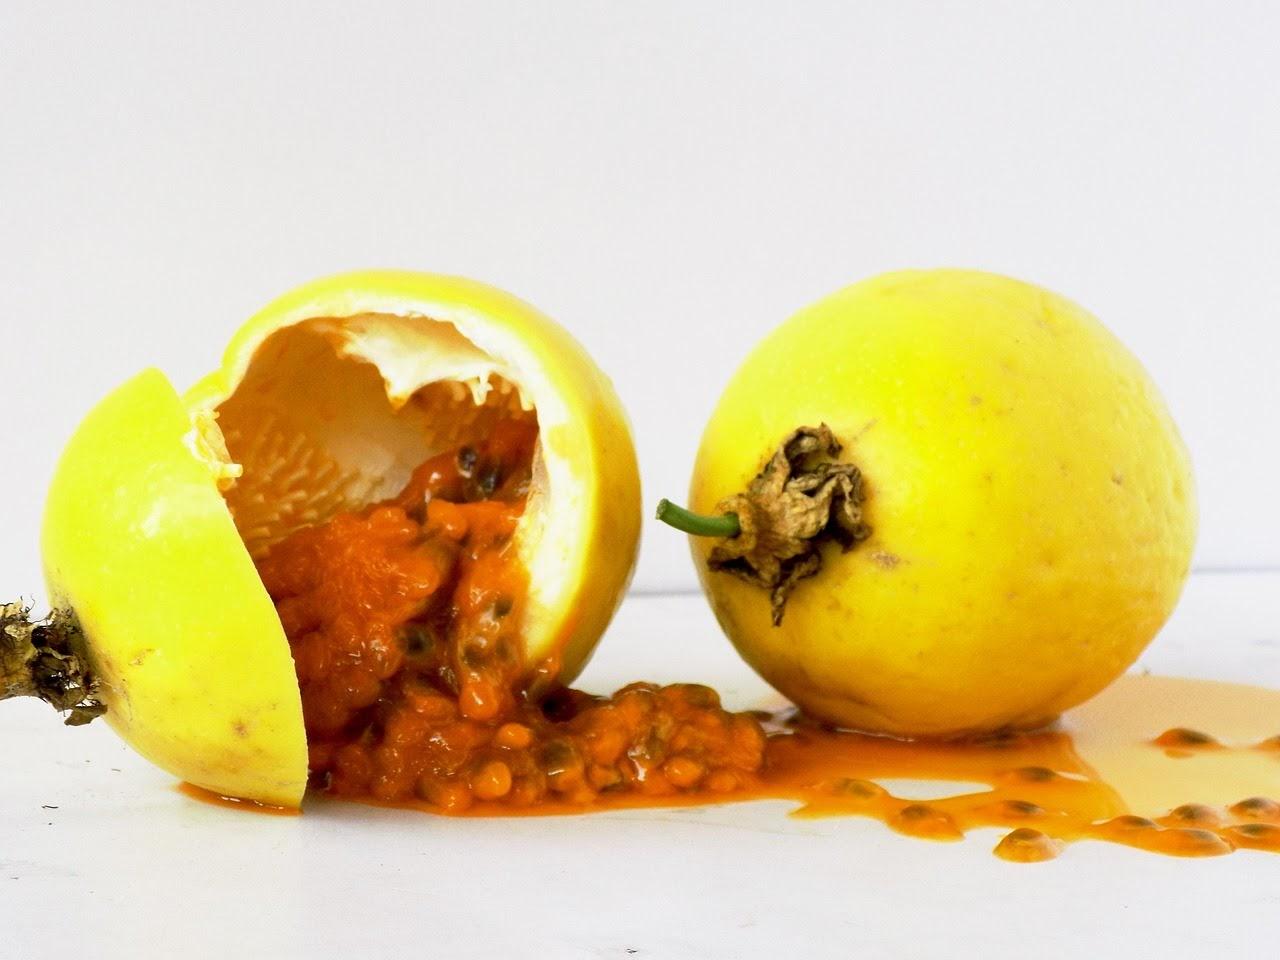 Fruta madura del mrurukuja